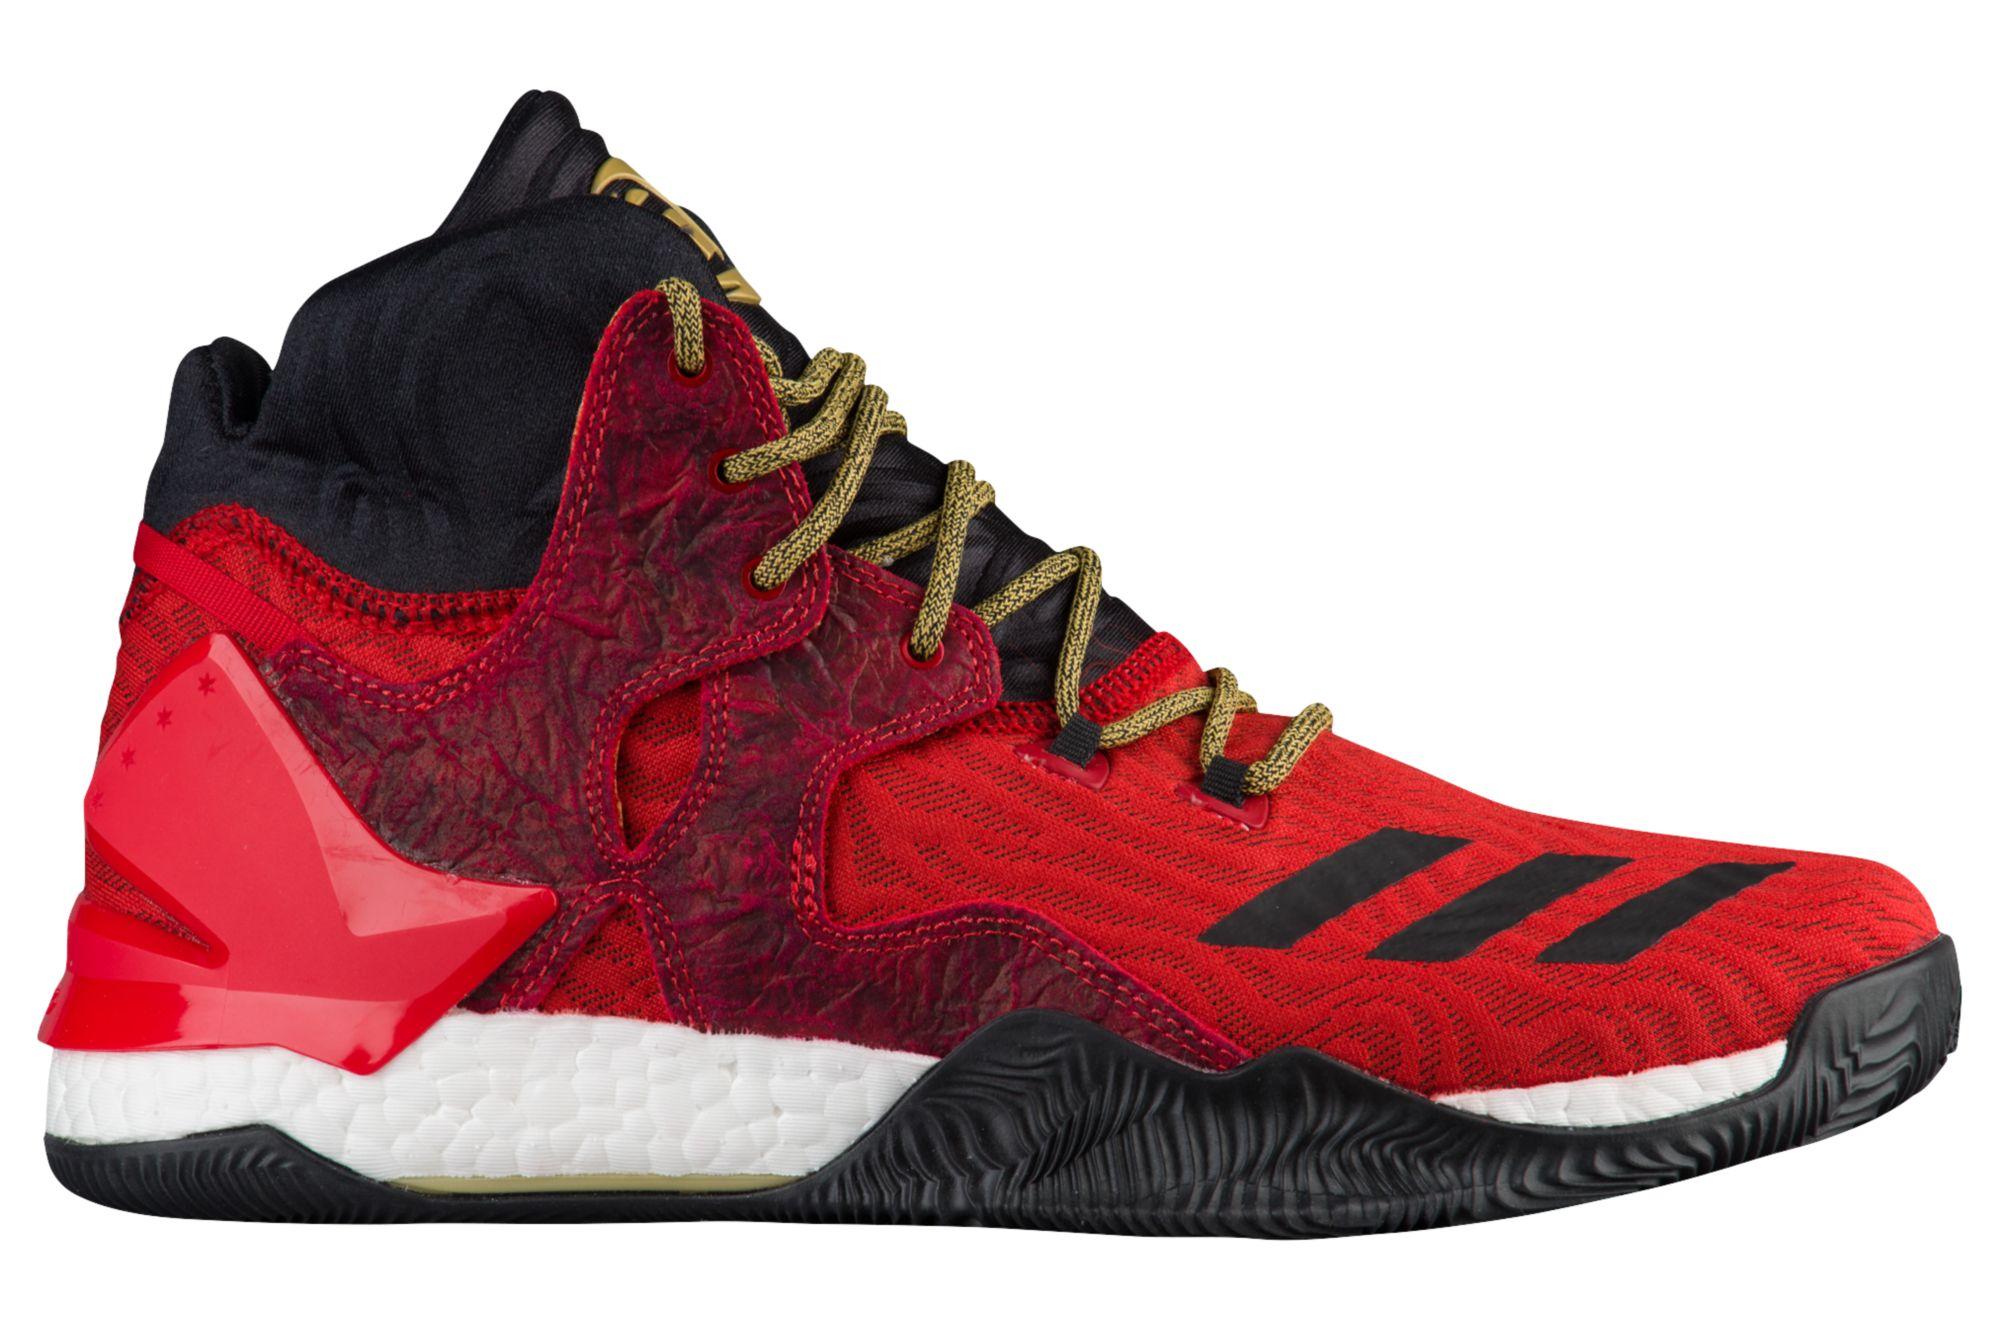 adidas d rose 7 scarlet gold 1